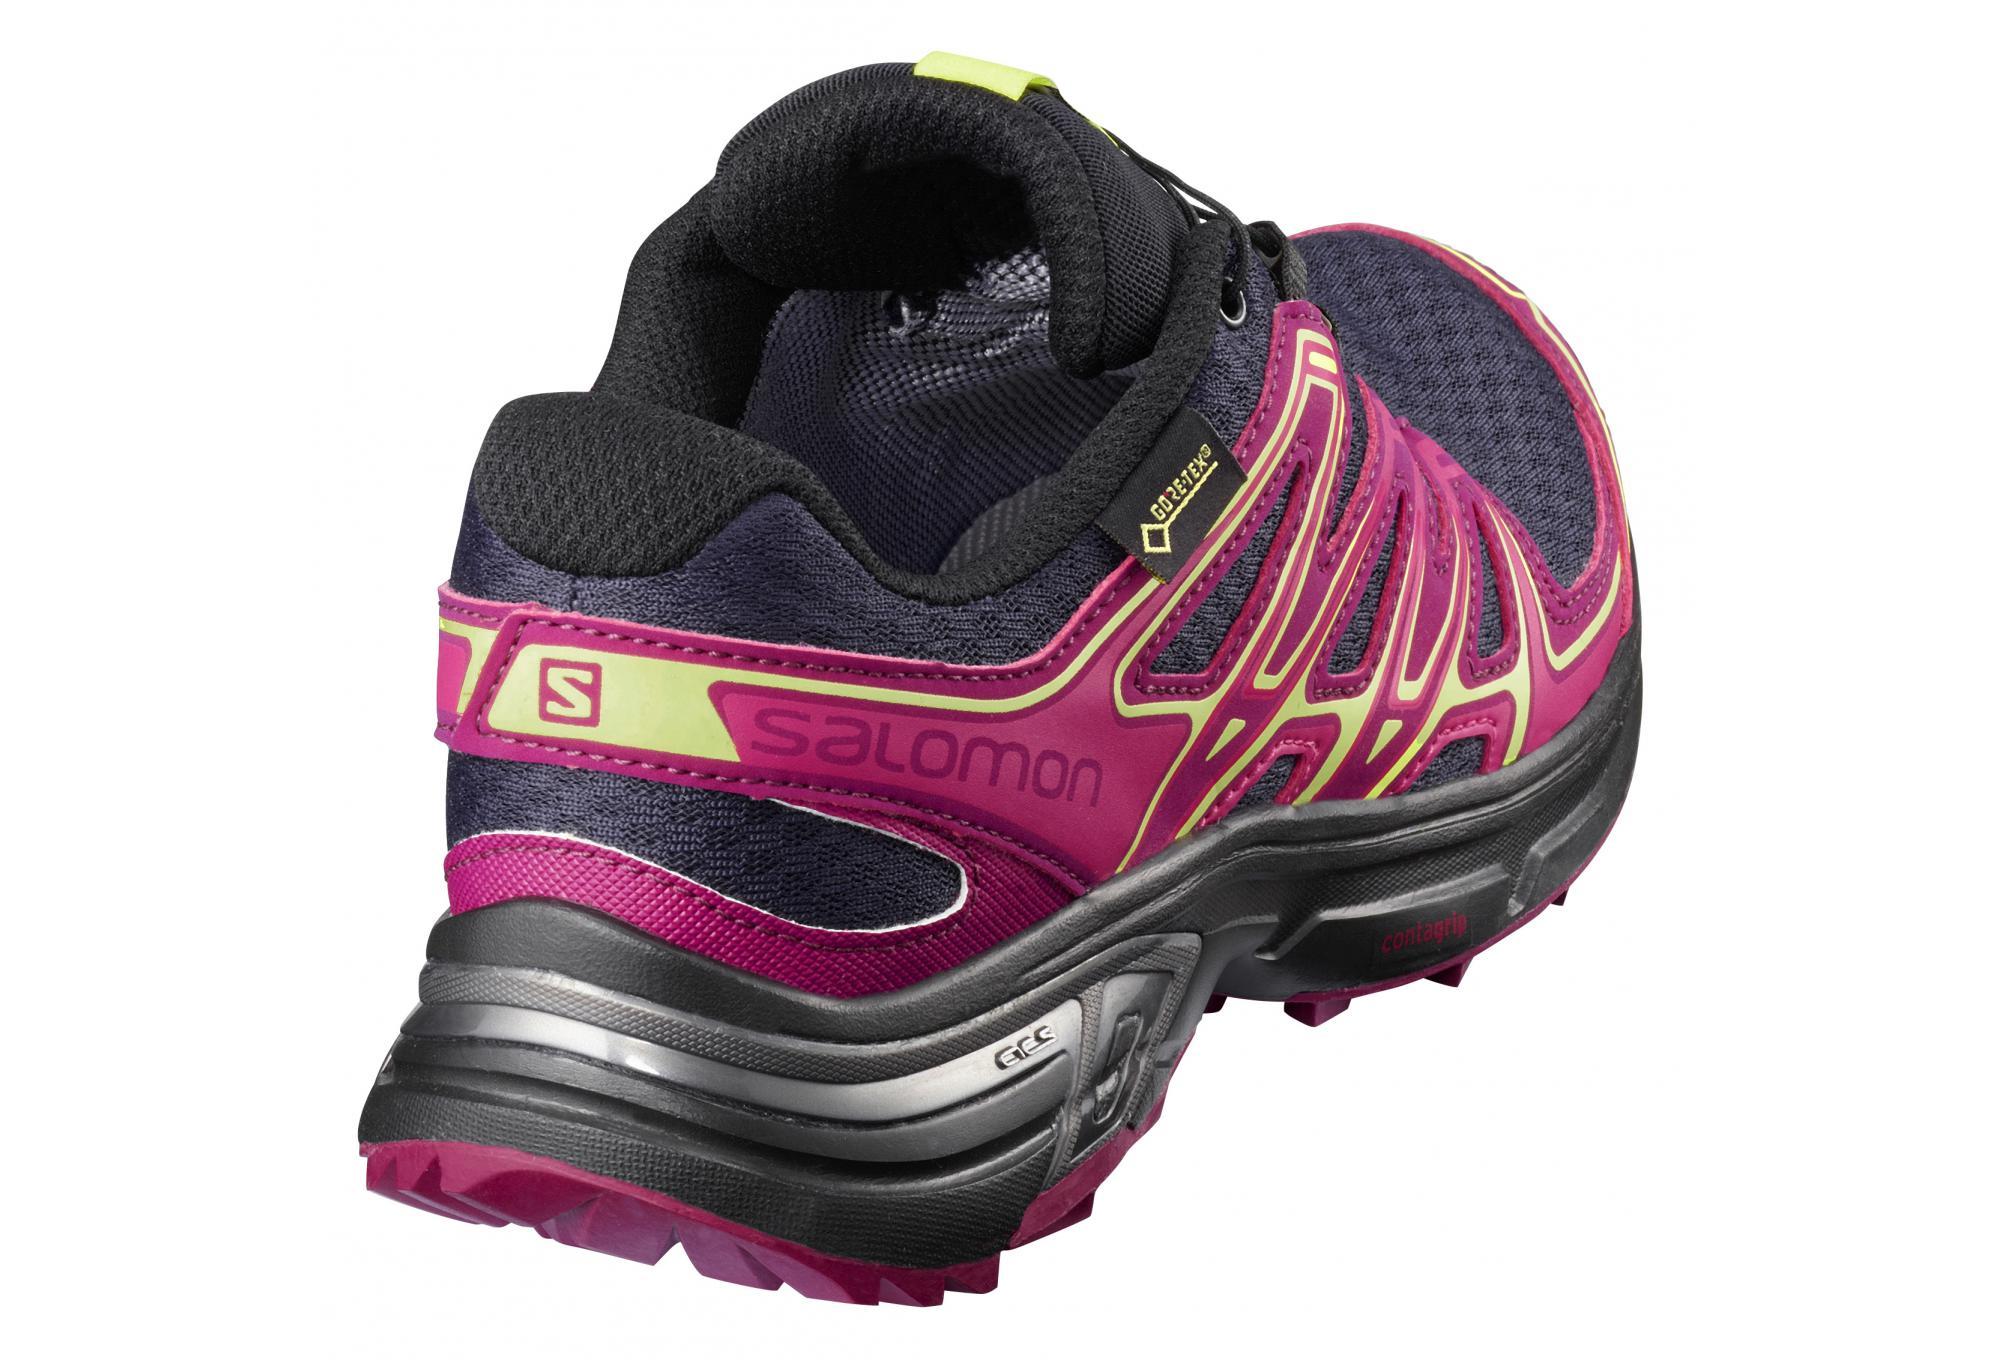 Salomon Femme Wings Flyte 2 GTX Chaussures de Course /à Pied et Trail Running Evening Blue//Beet Red//Sunny Lime Bleu